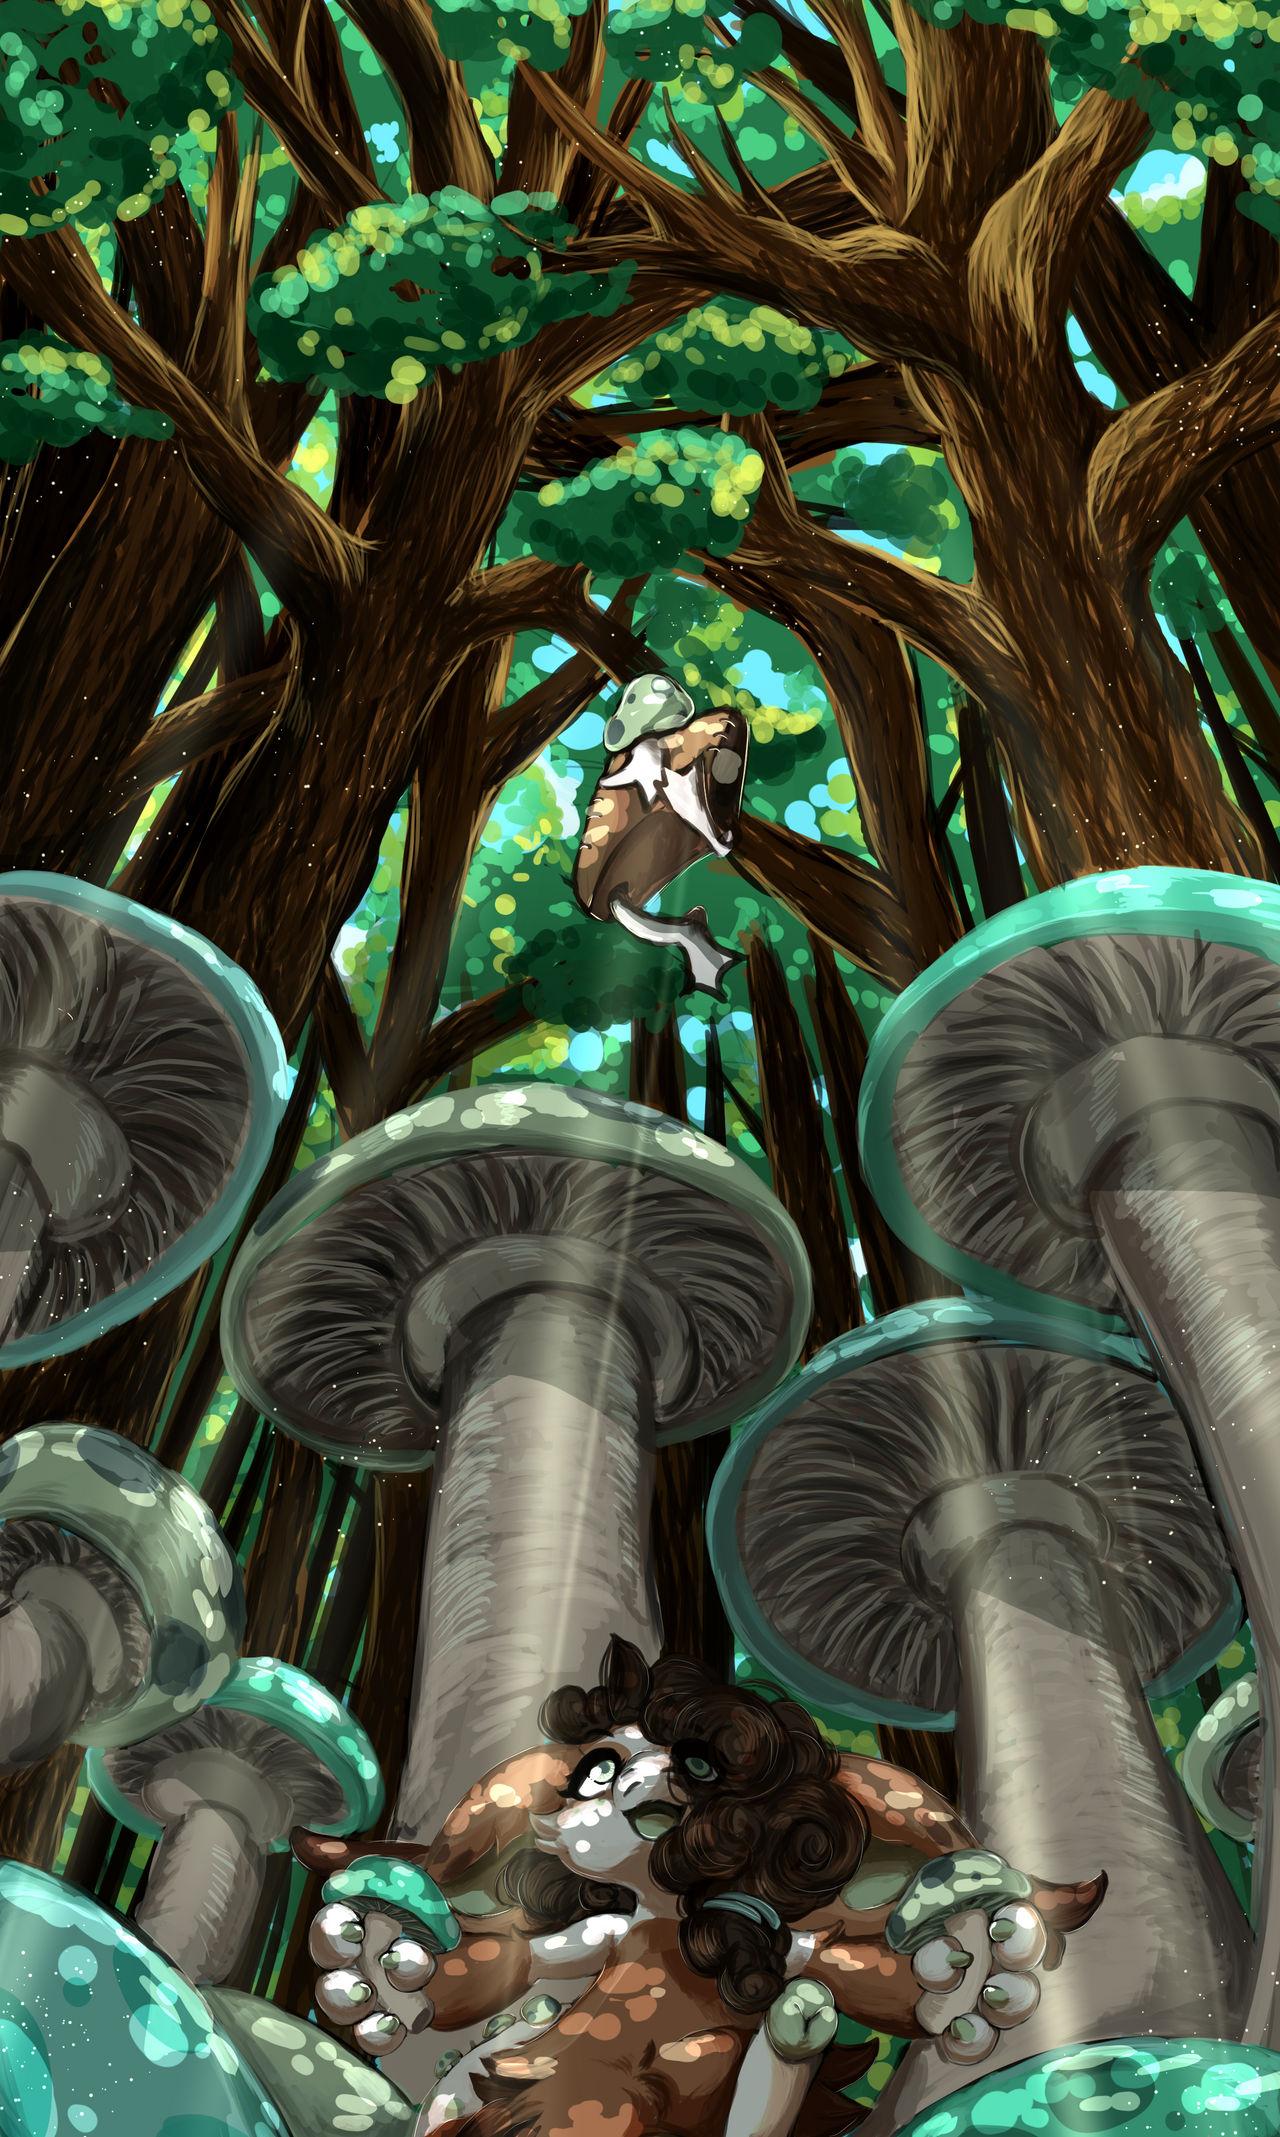 |Bagbeans|: A Mellow Mycologist (DTA Entry)